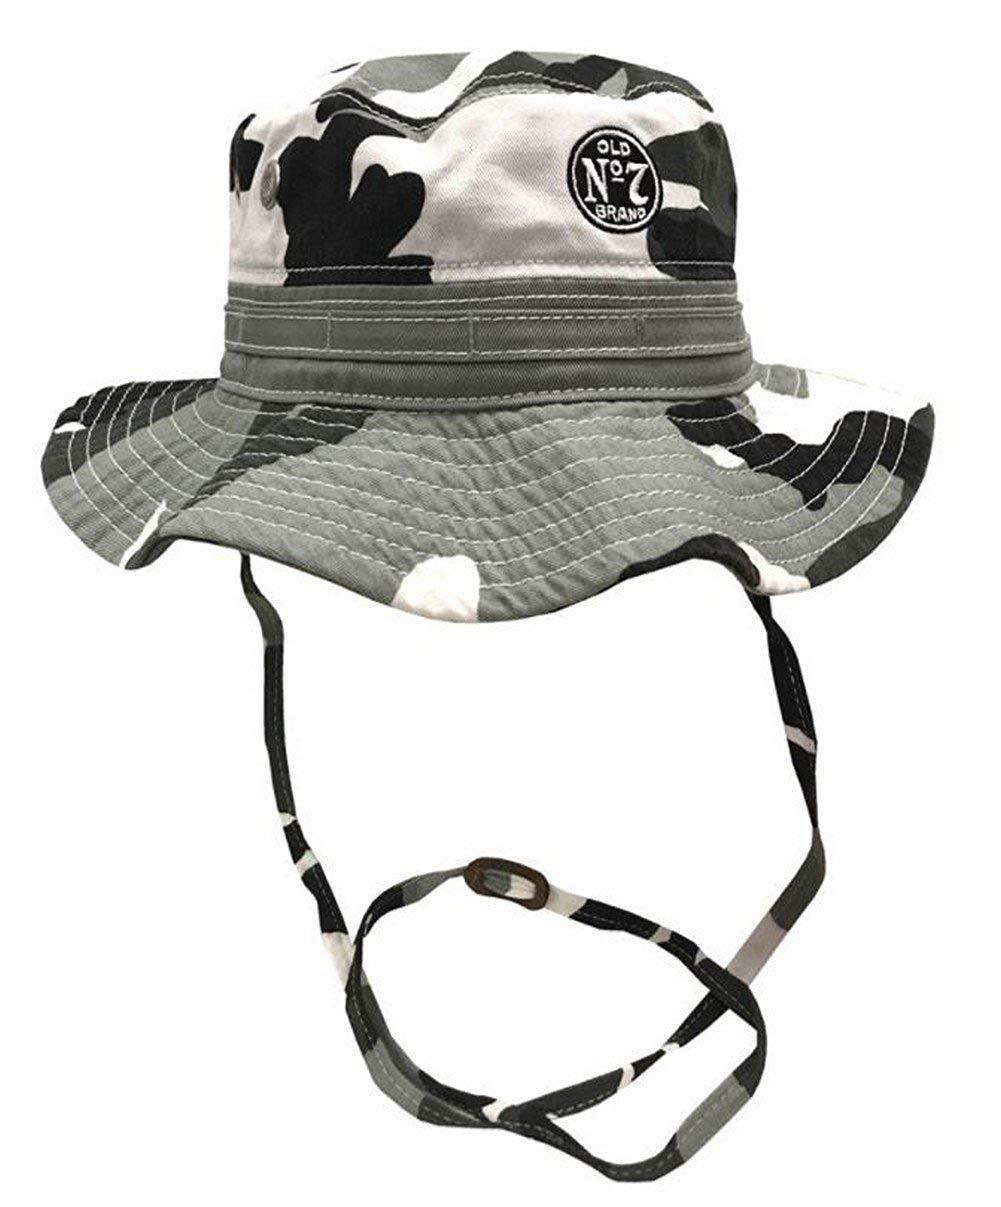 Jack Daniels Men s Wide Brim Boonie Fishing Bucket Hat Gray Camouflage  JD77-124 bfbd5c982